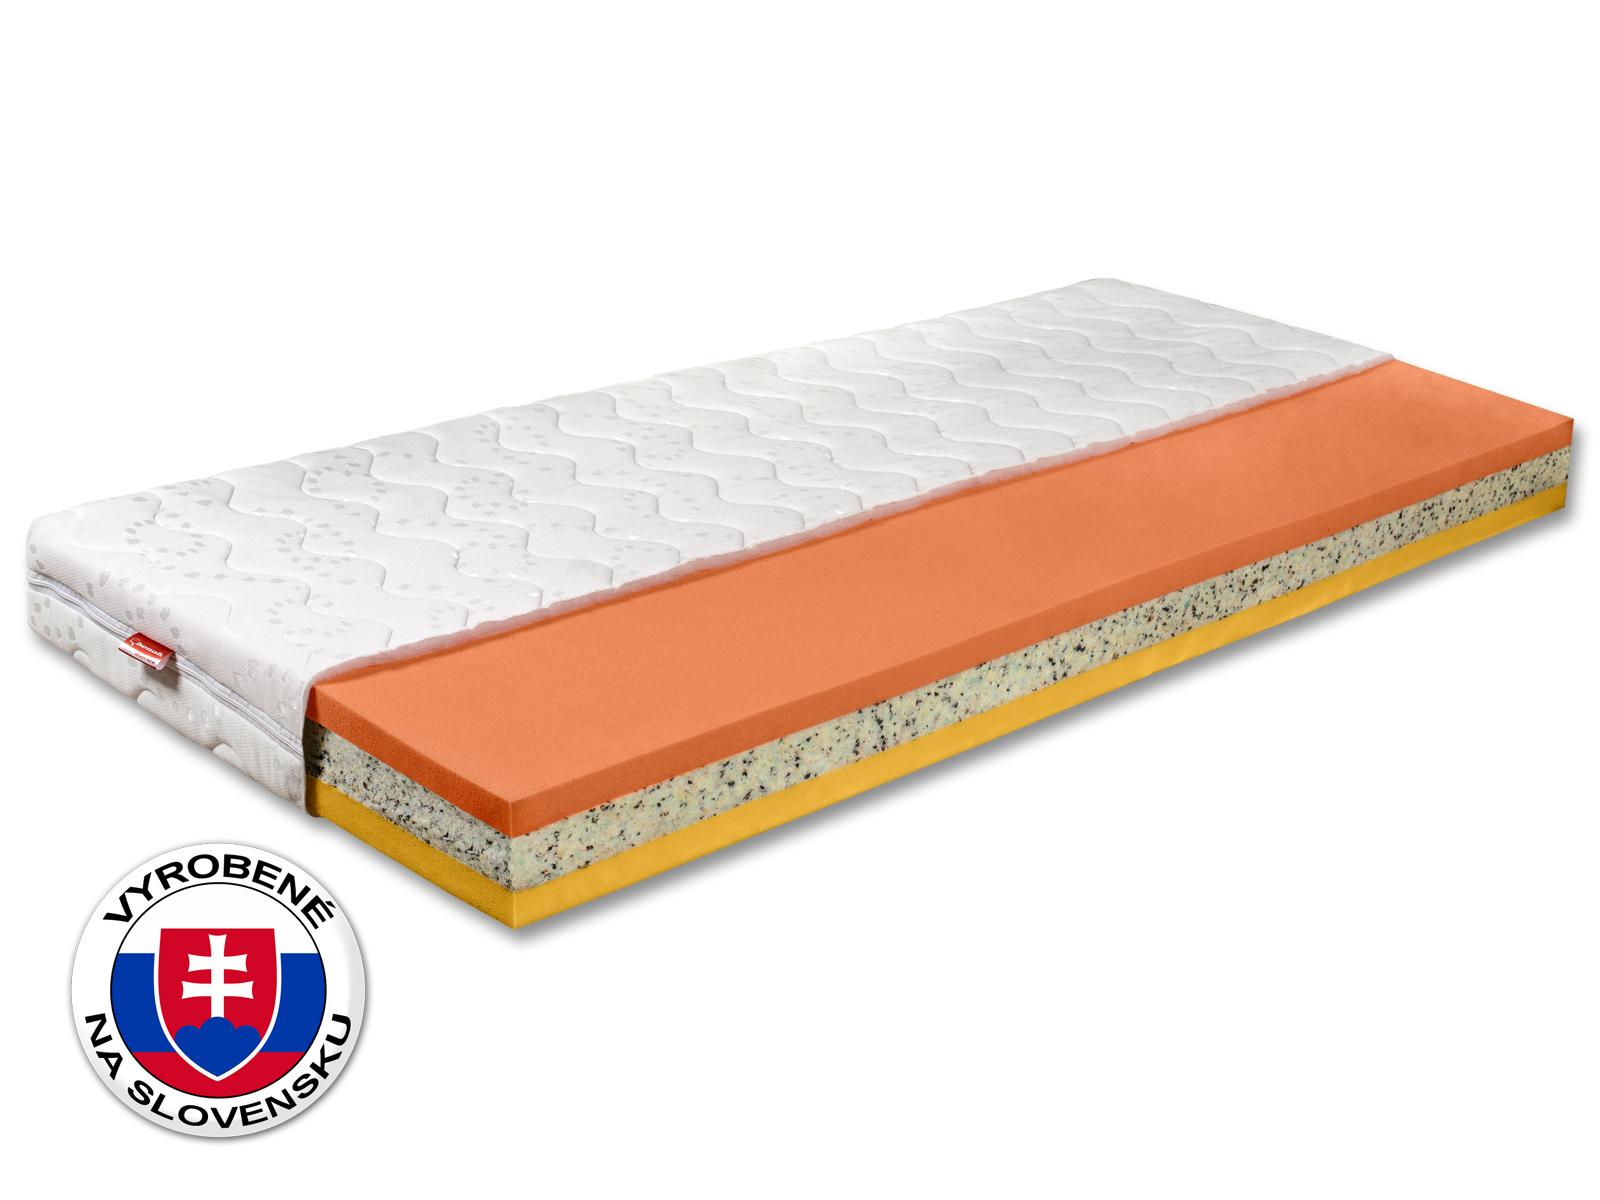 Penový matrac - Benab - Hard Plus - 200x80 cm (T3/T4)